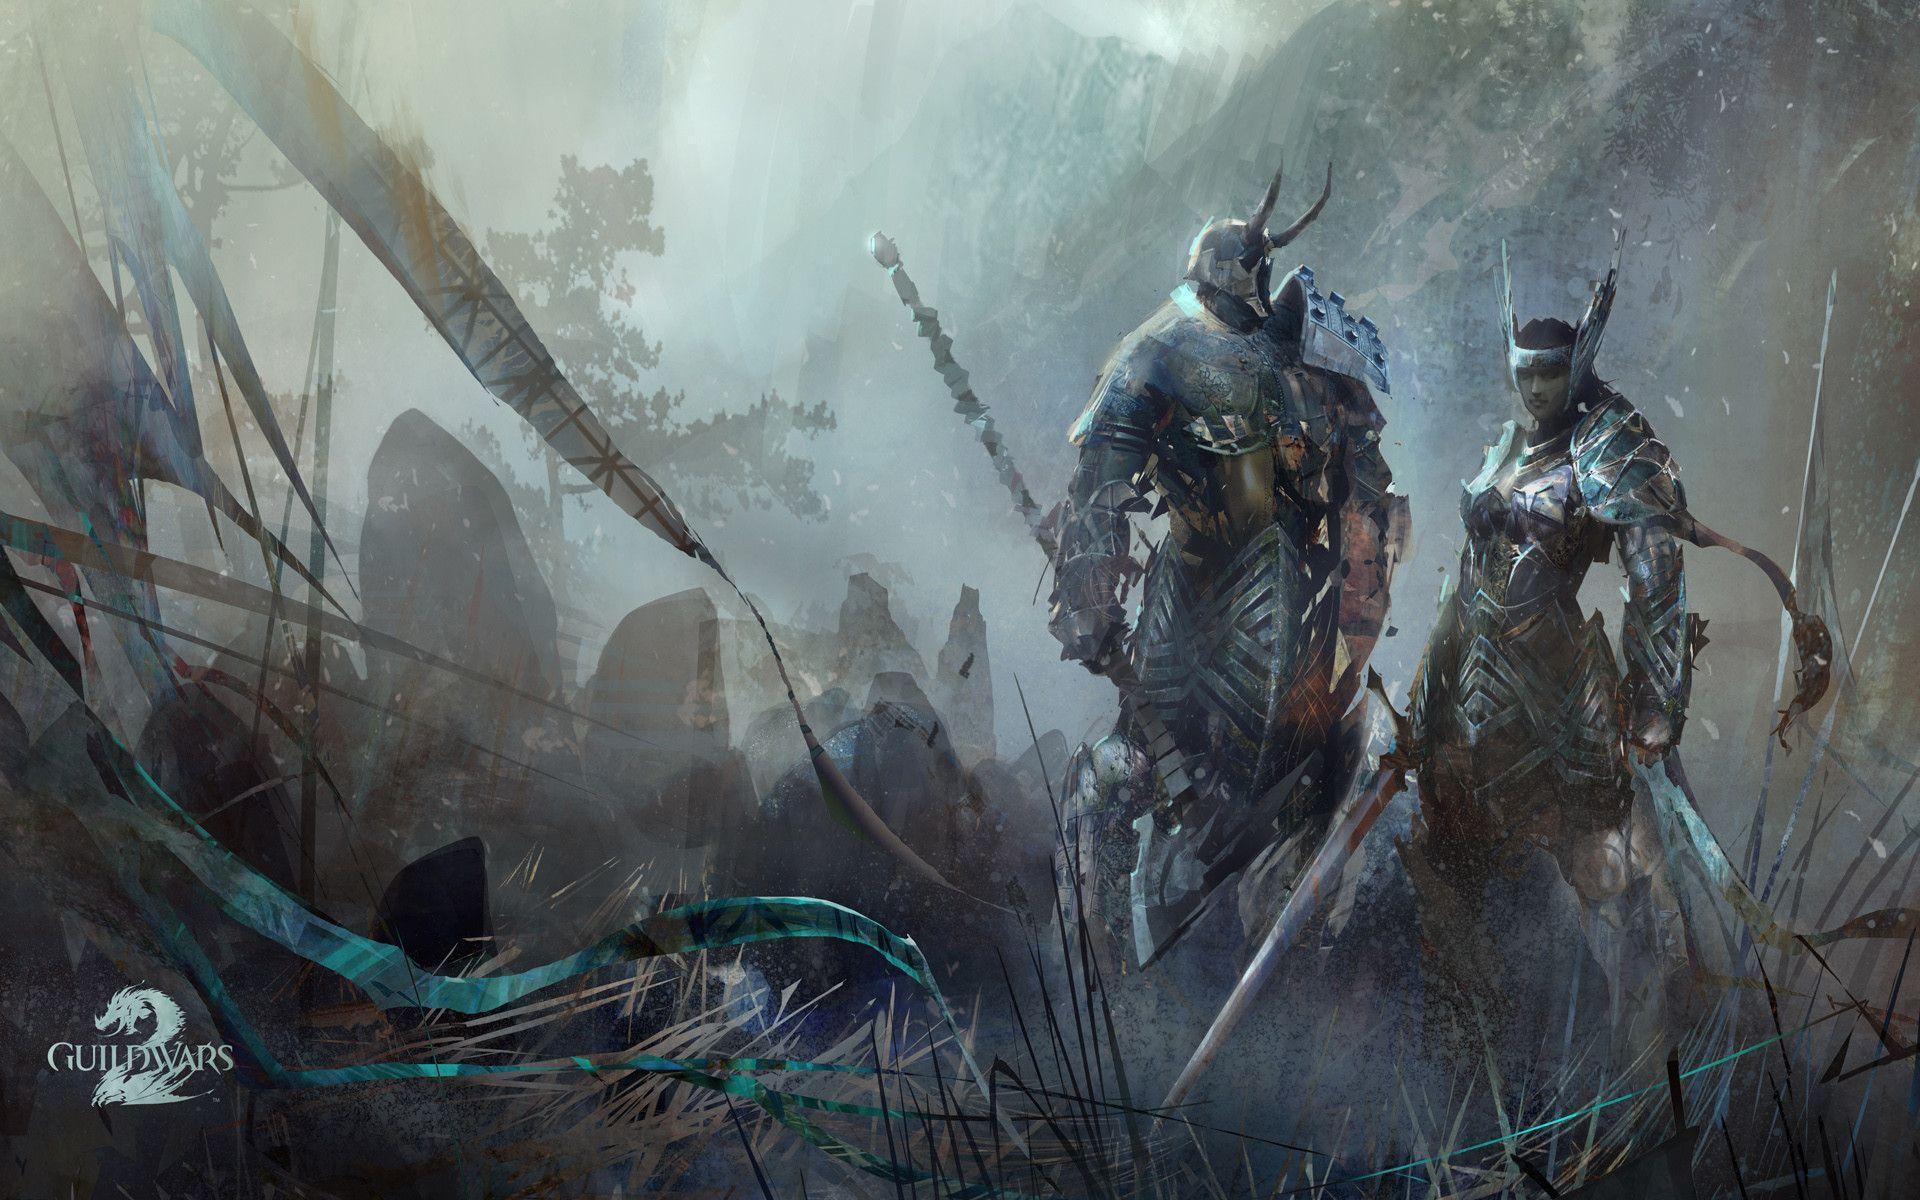 Guild Wars 2 Guardian Wallpapers - Wallpaper Cave